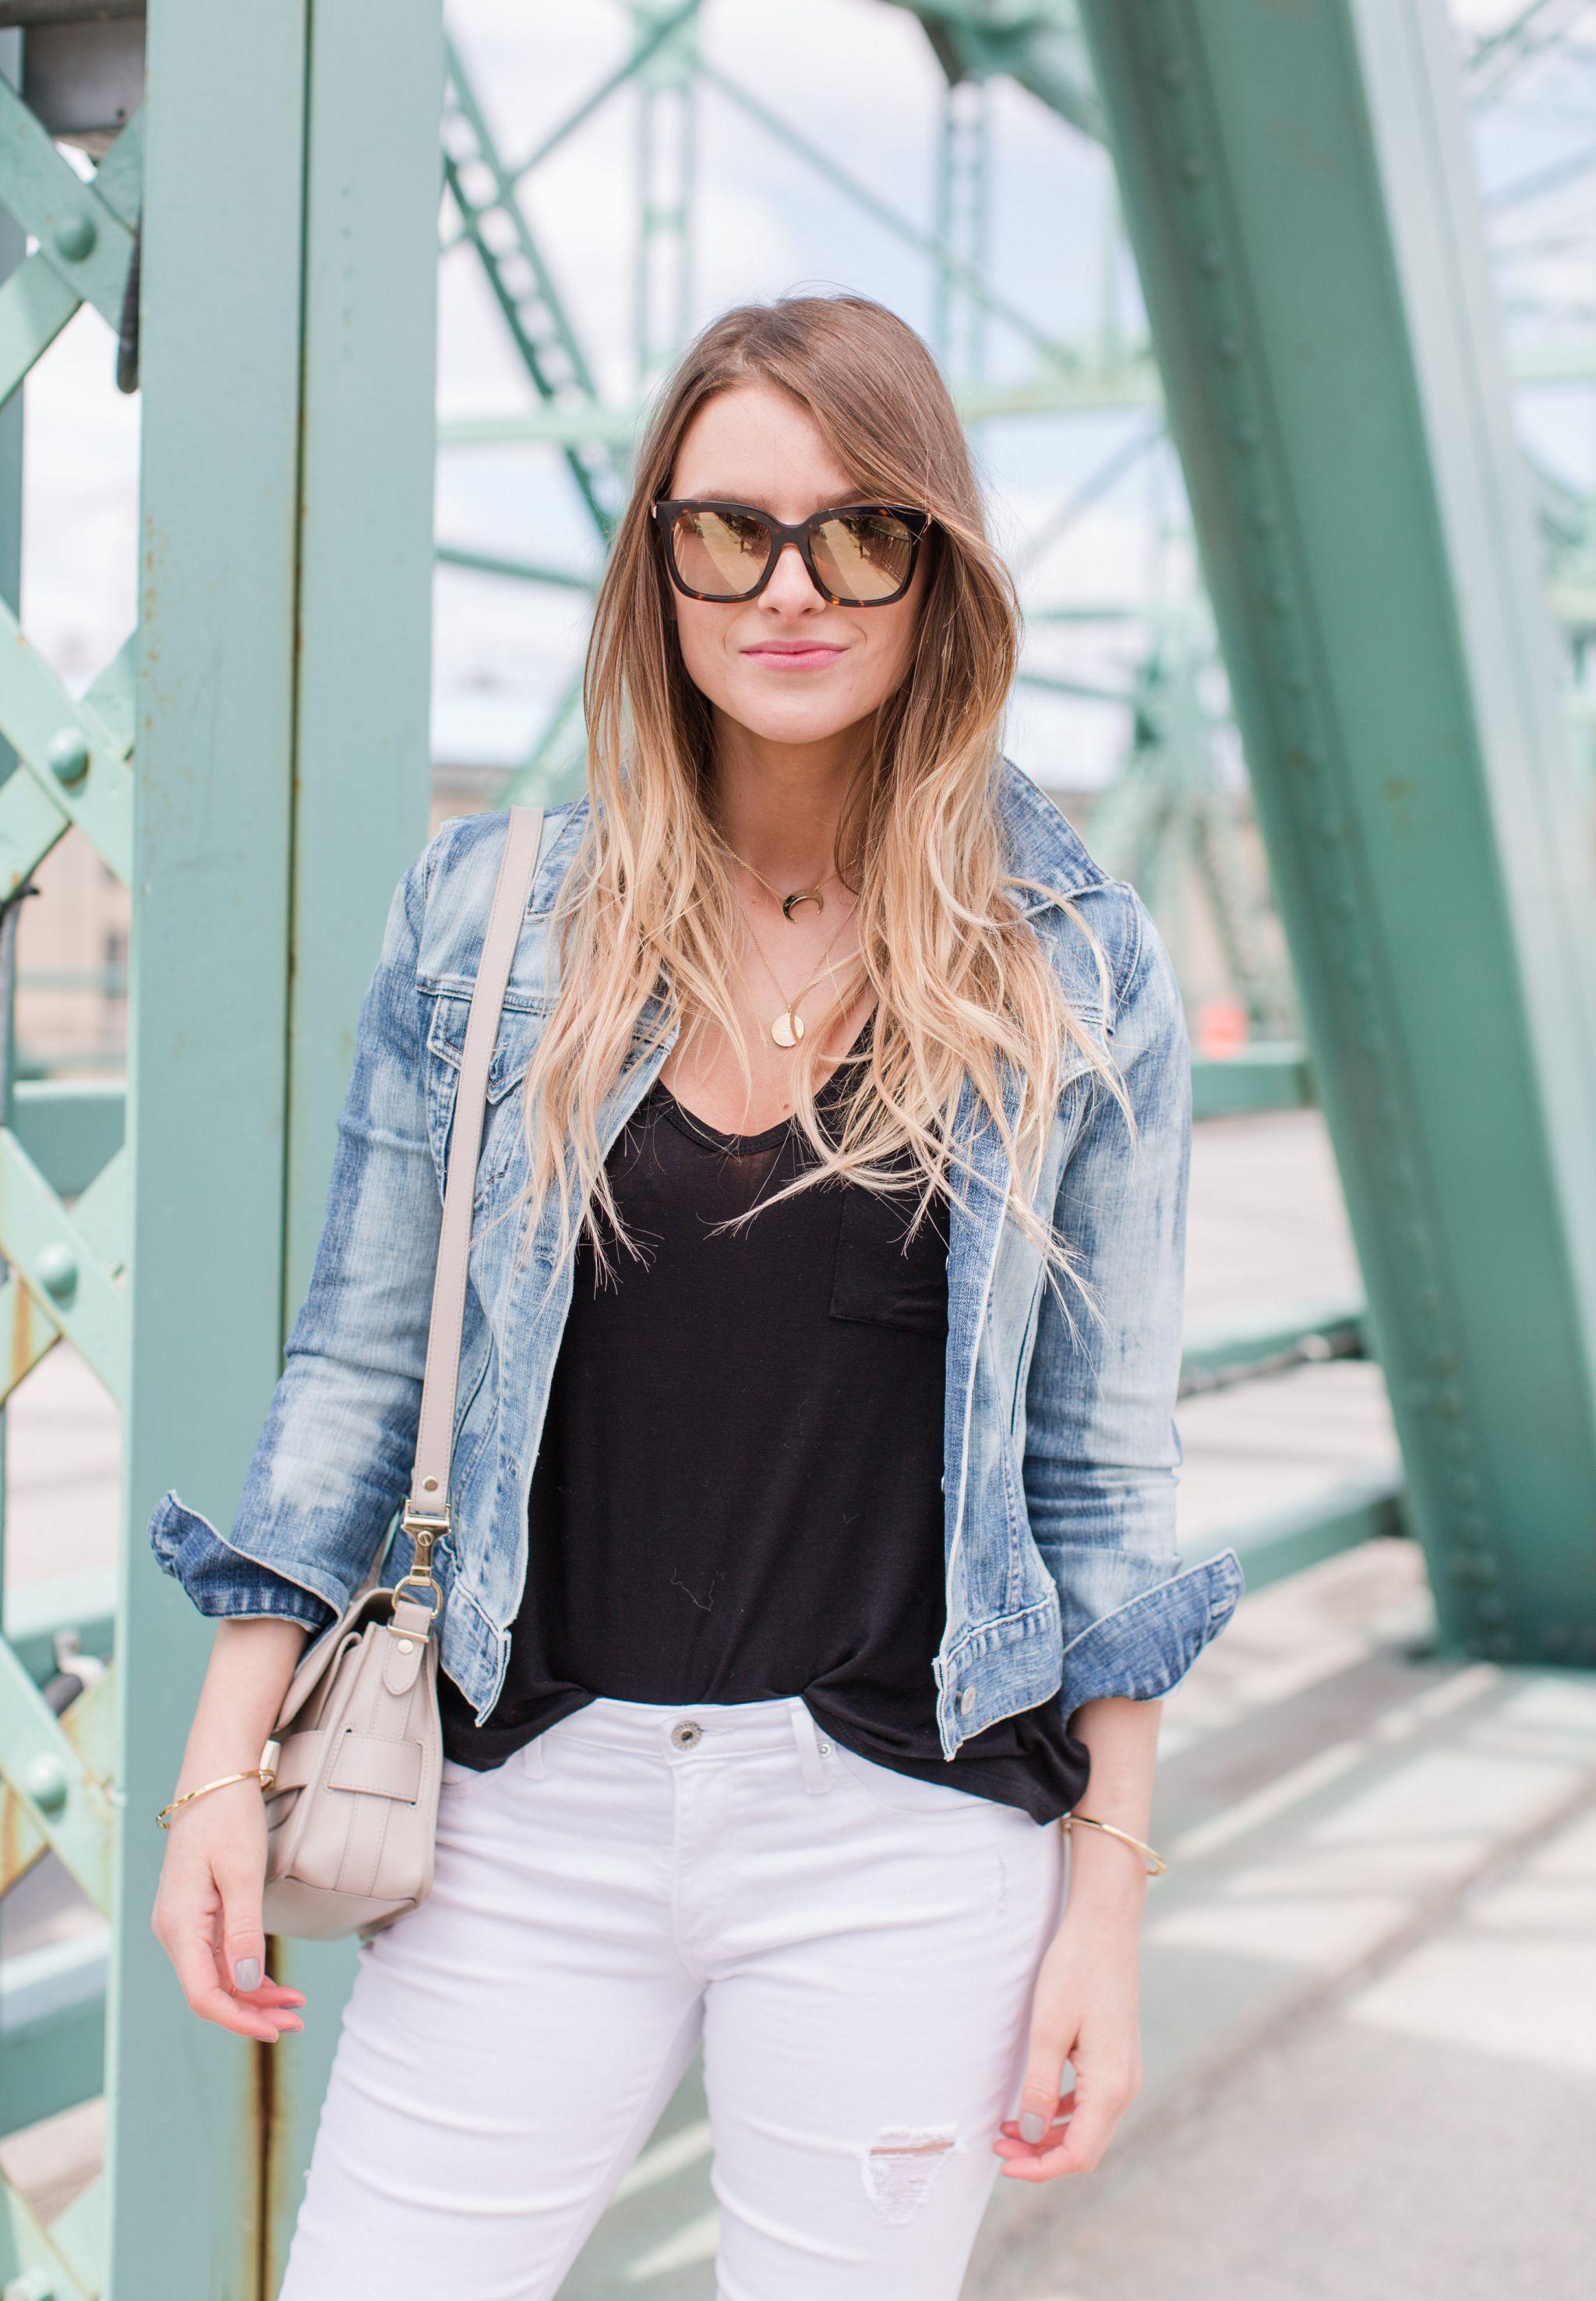 1 person, fashion blogger on bridge, Ottawa bridge